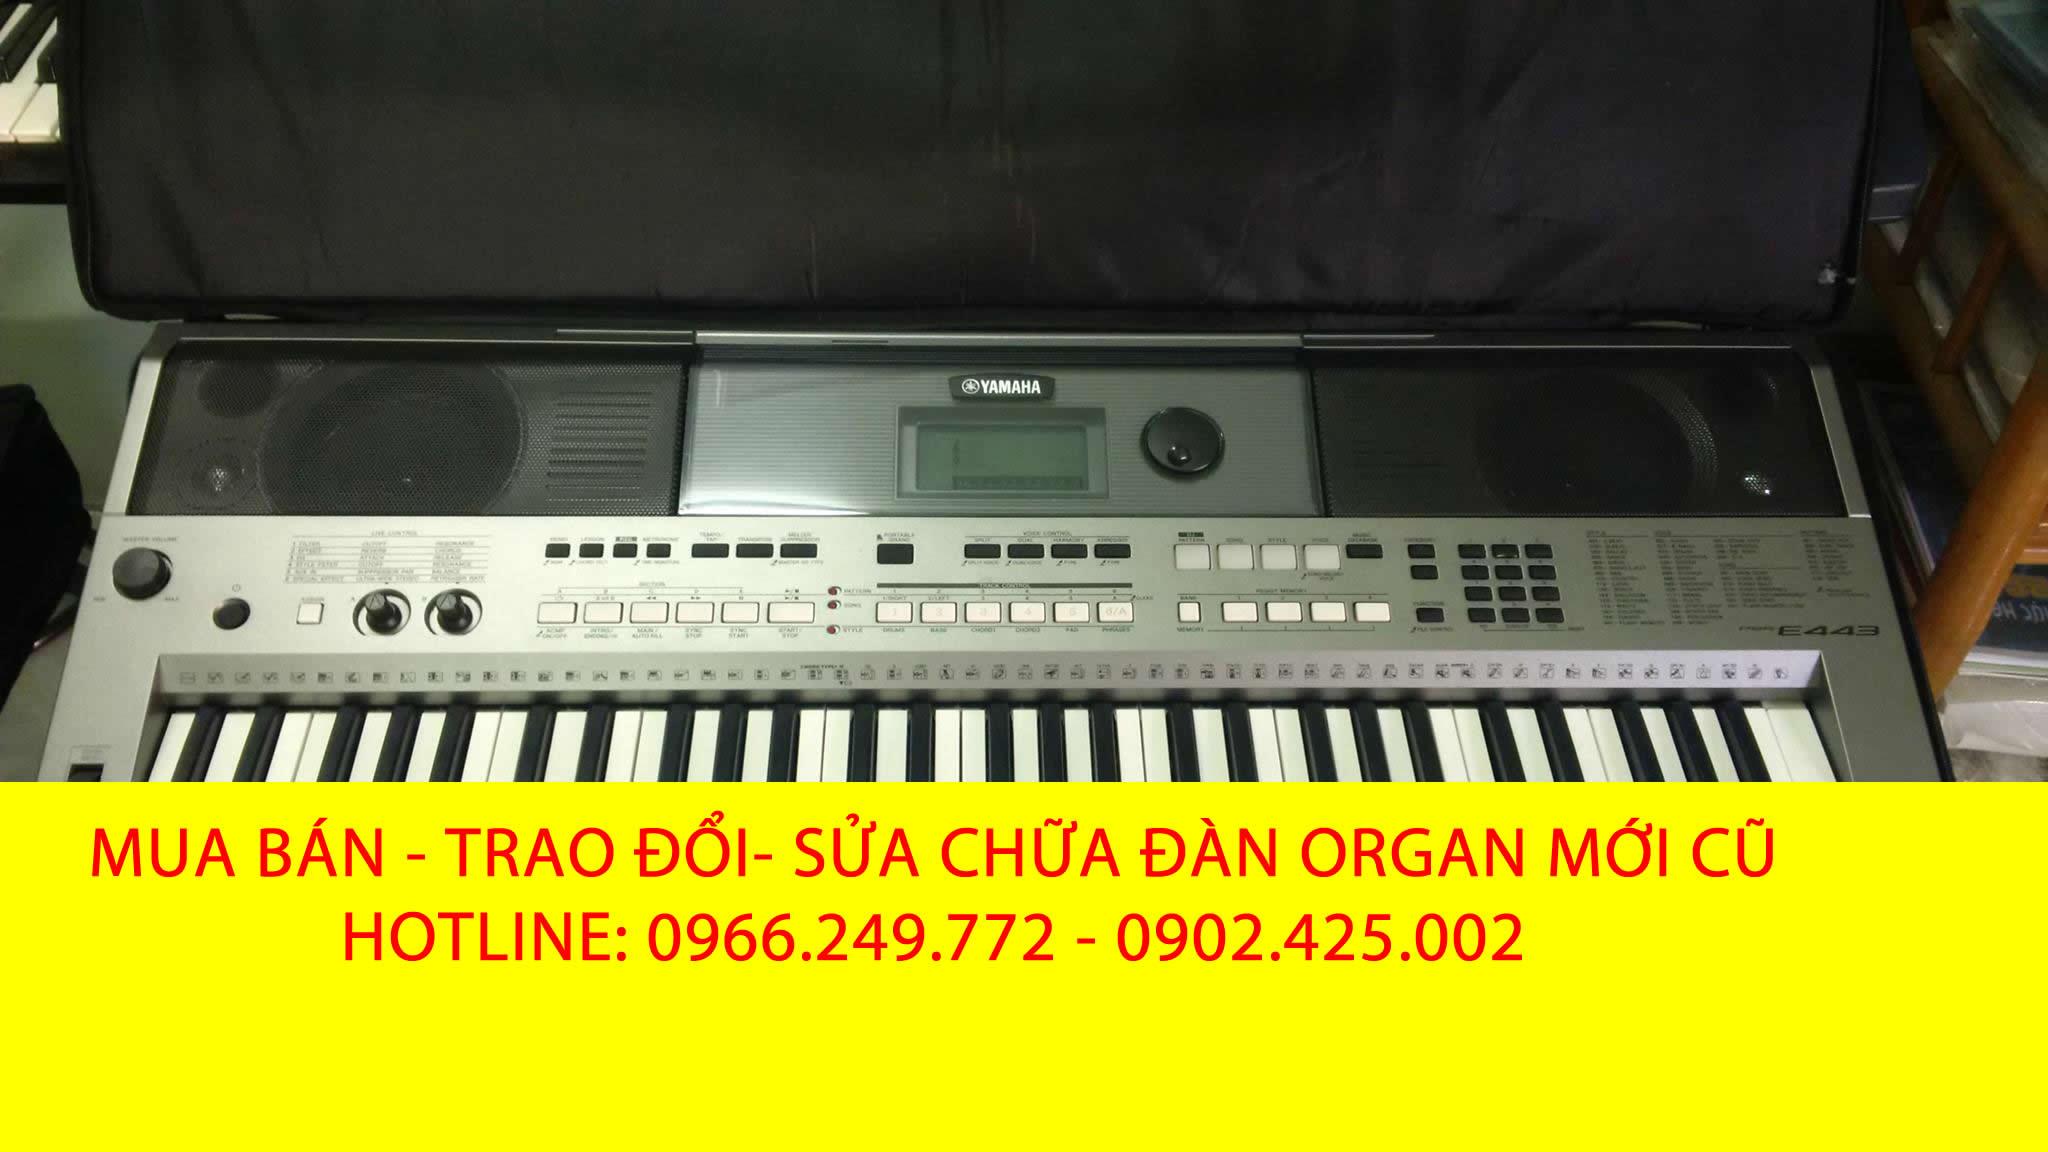 bán đàn organ psr e453 mơi giá rẻ